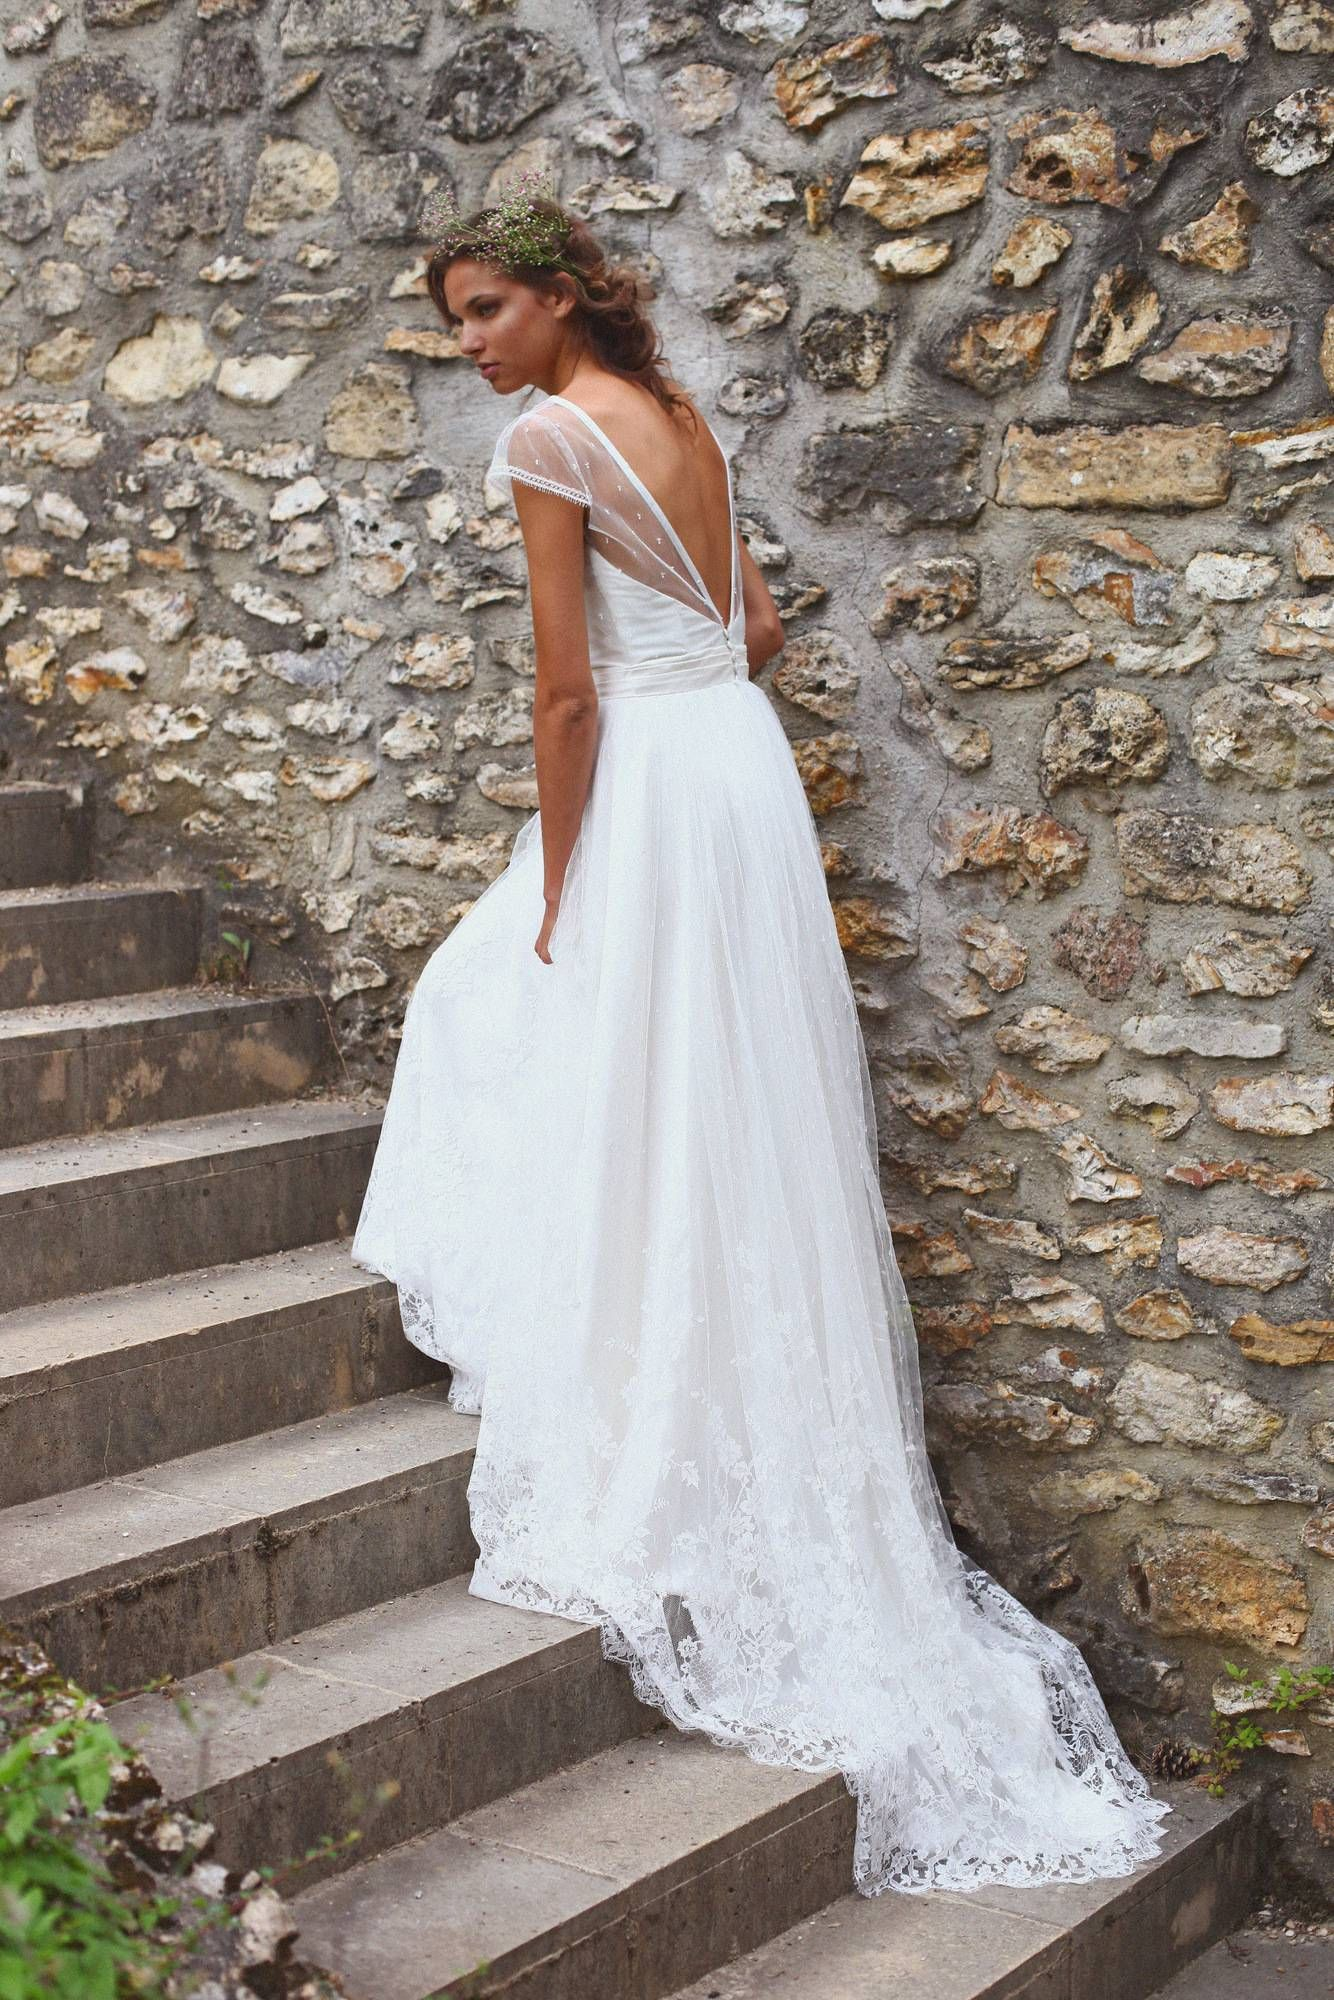 Lys Adeline Bauwin Créatrice De Robe De Mariée Sur Mesure Robe De Mariée Dentelle Robe De Mariée Princesse Robe Boheme Mariage